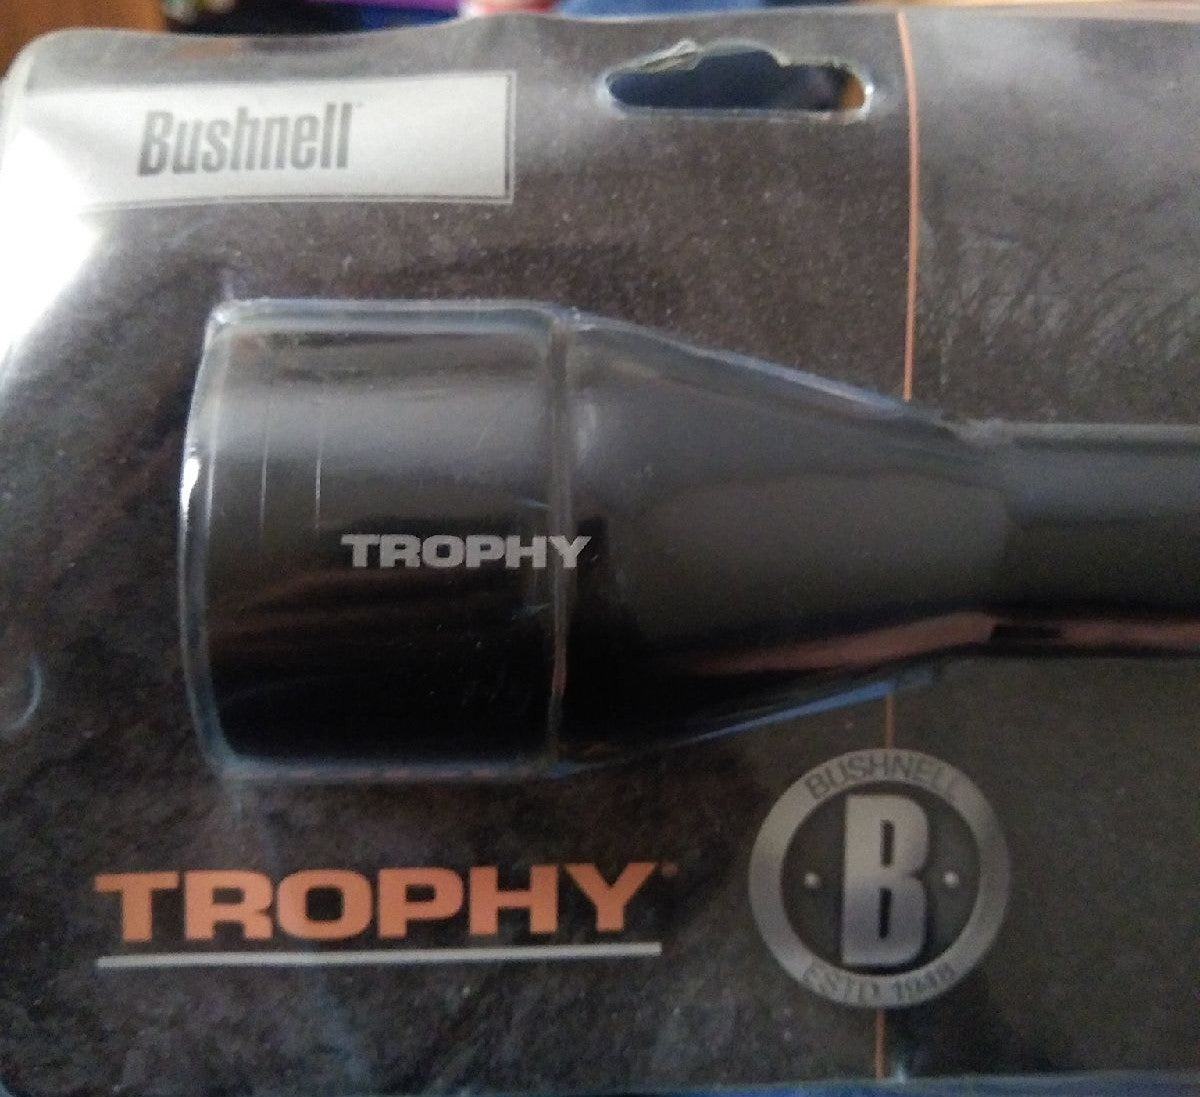 Bushnell 3-9X40 Trophy scope